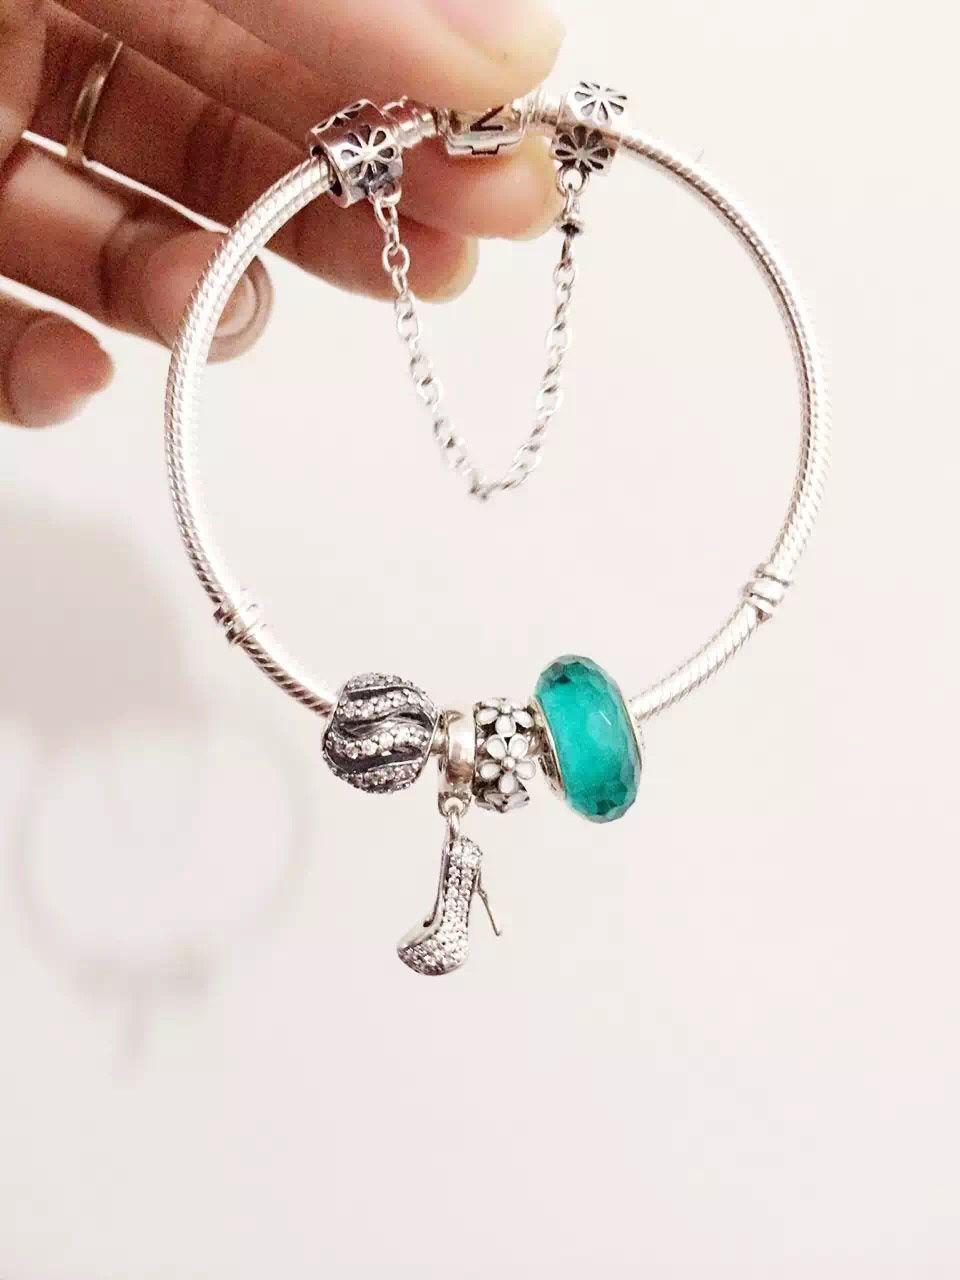 68d5fbe5a $159 Pandora Charm Bracelet Green White. Hot Sale!!! SKU: CB01811 - PANDORA  Bracelet Ideas